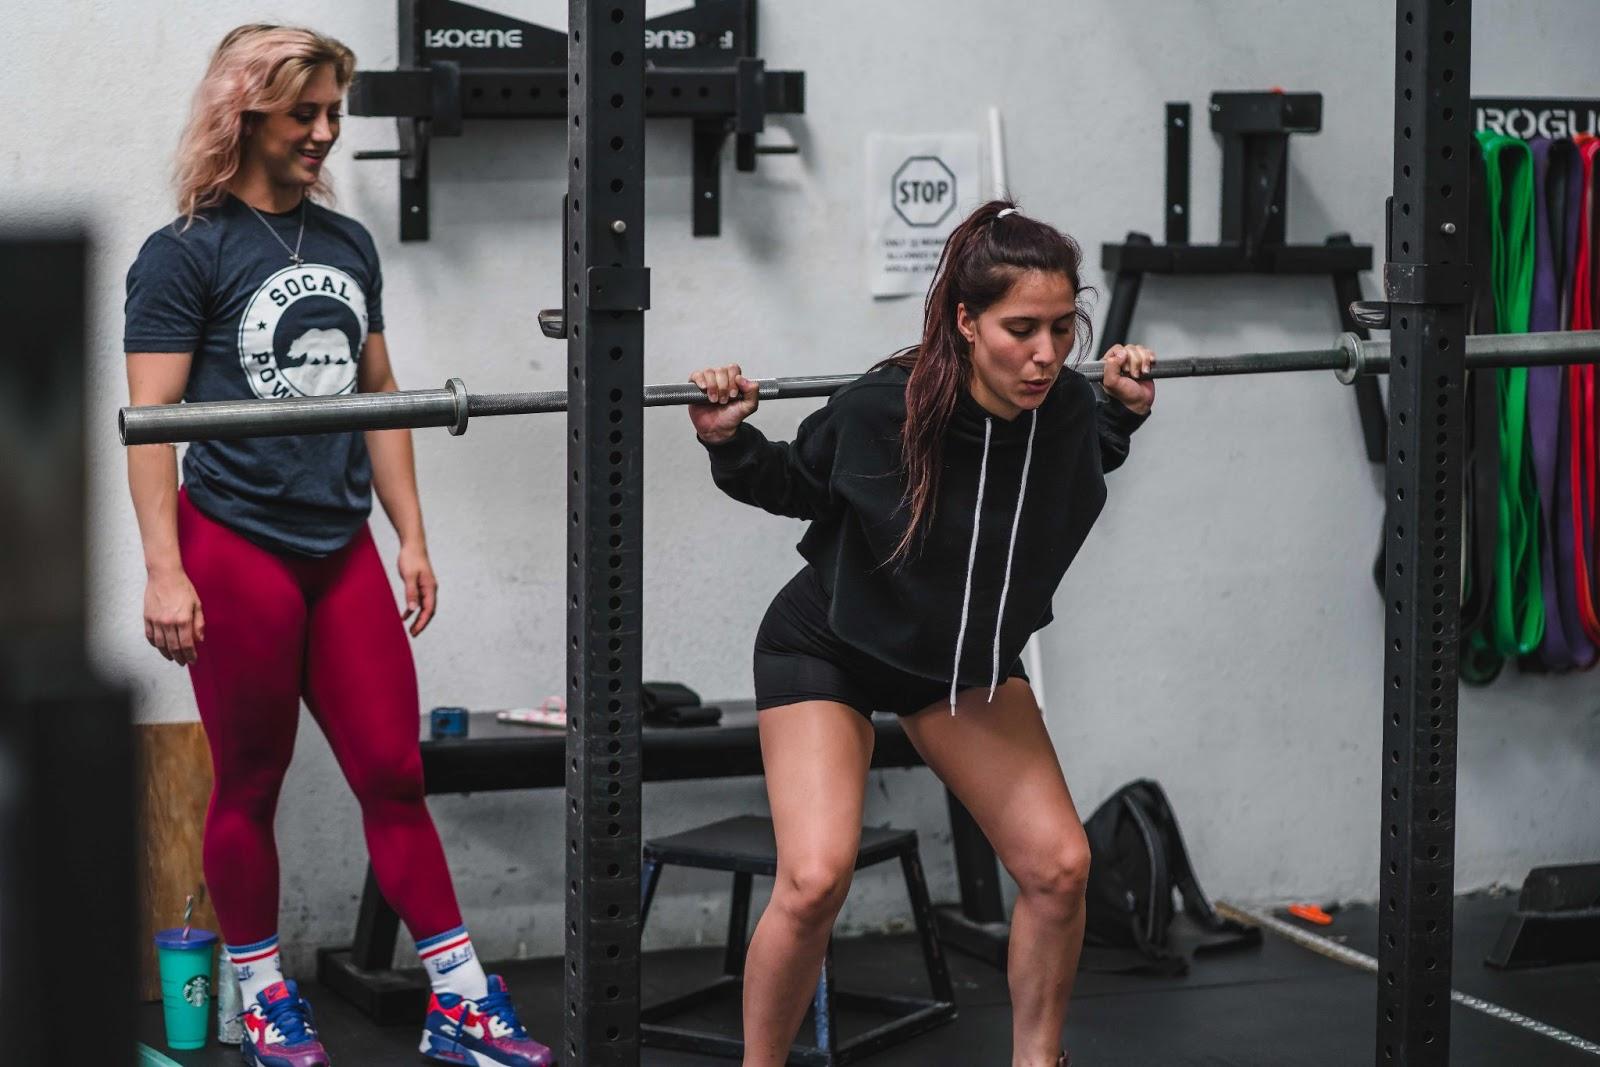 Woman performing barbell squat